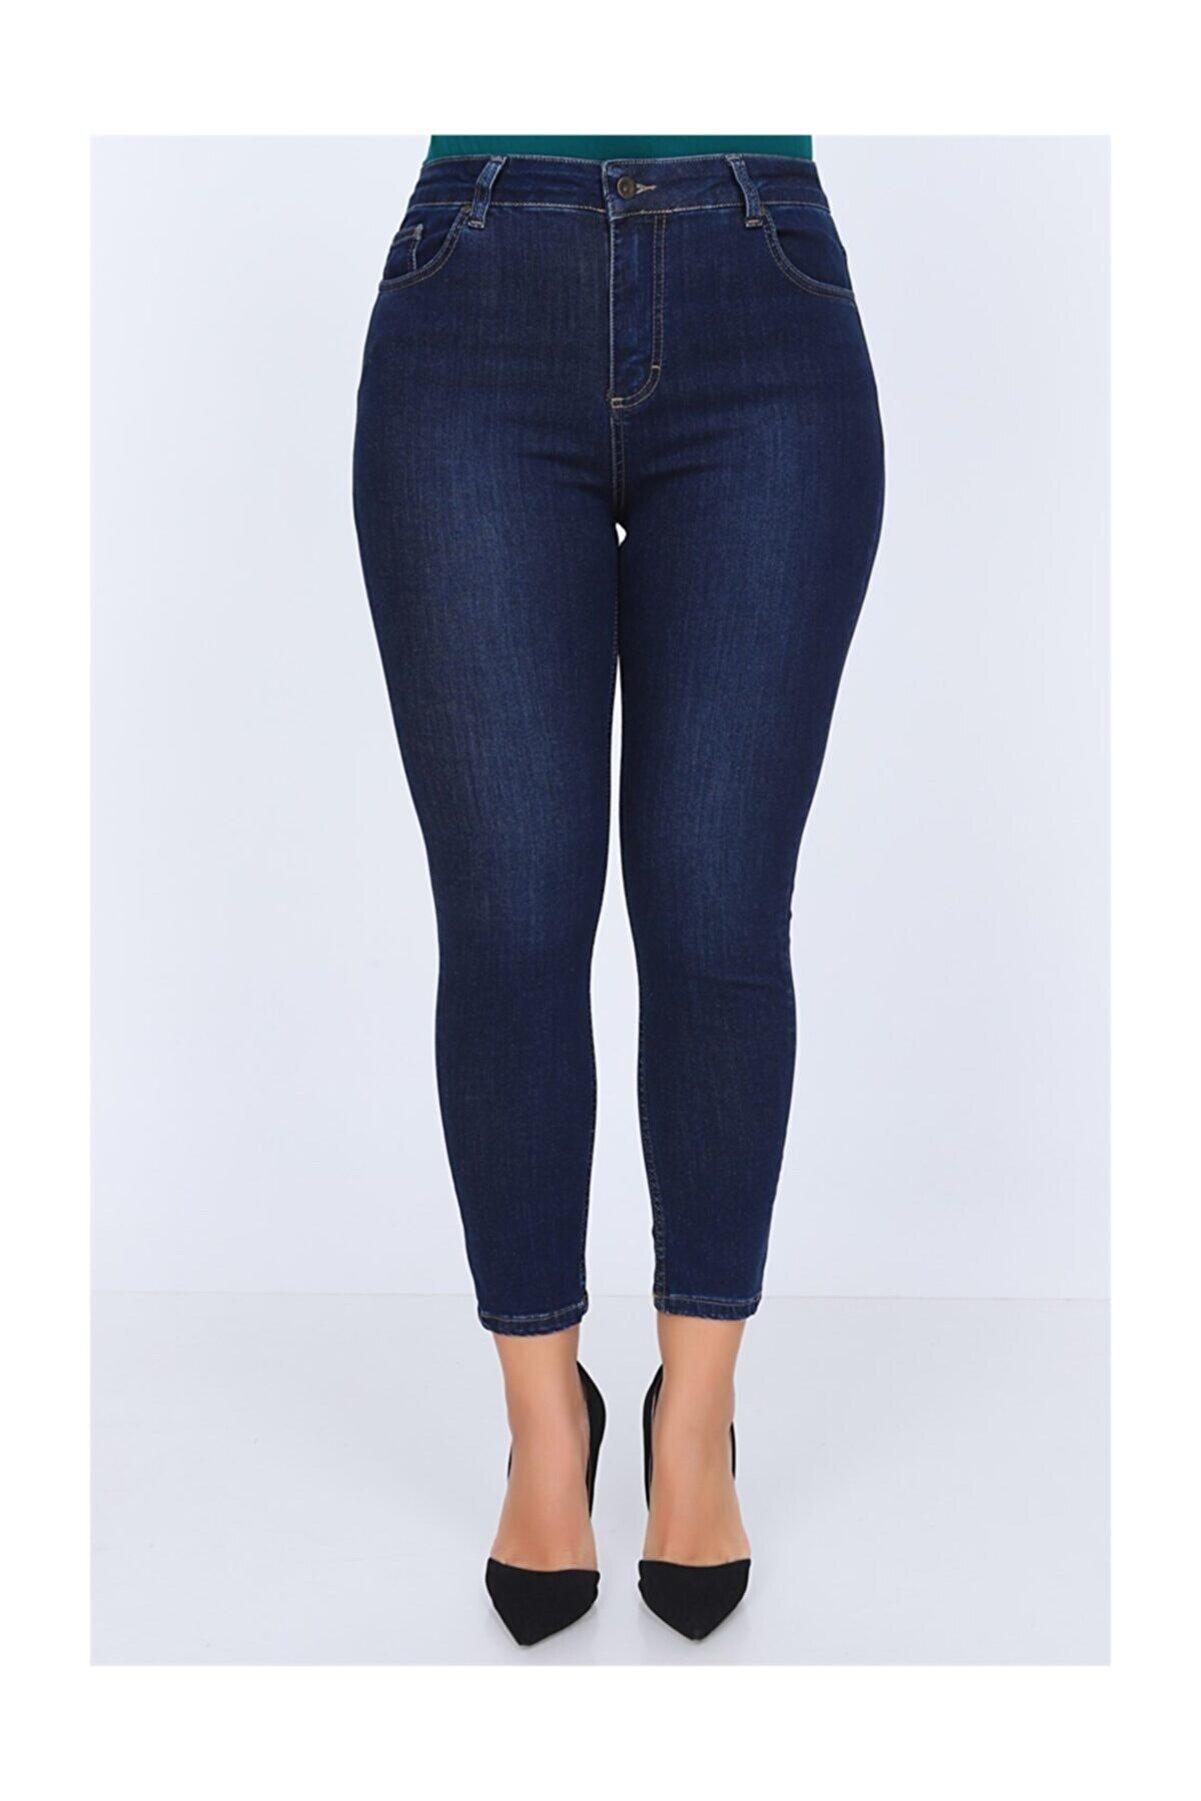 Rmg Kadın Lacivert Kot Pantolon 1465